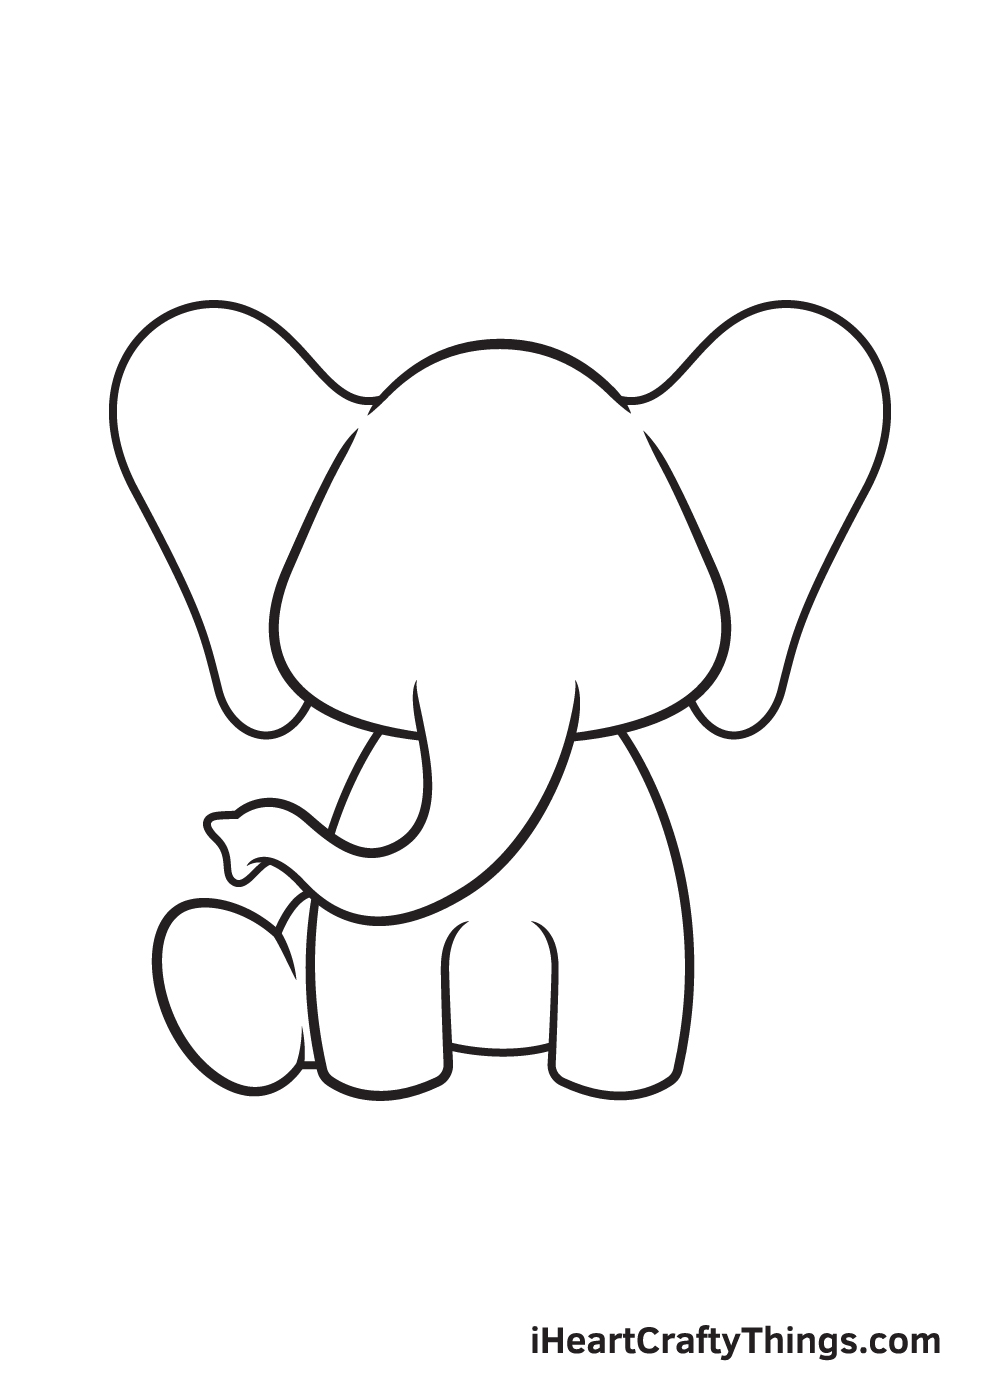 Elephant Drawing – Step 6